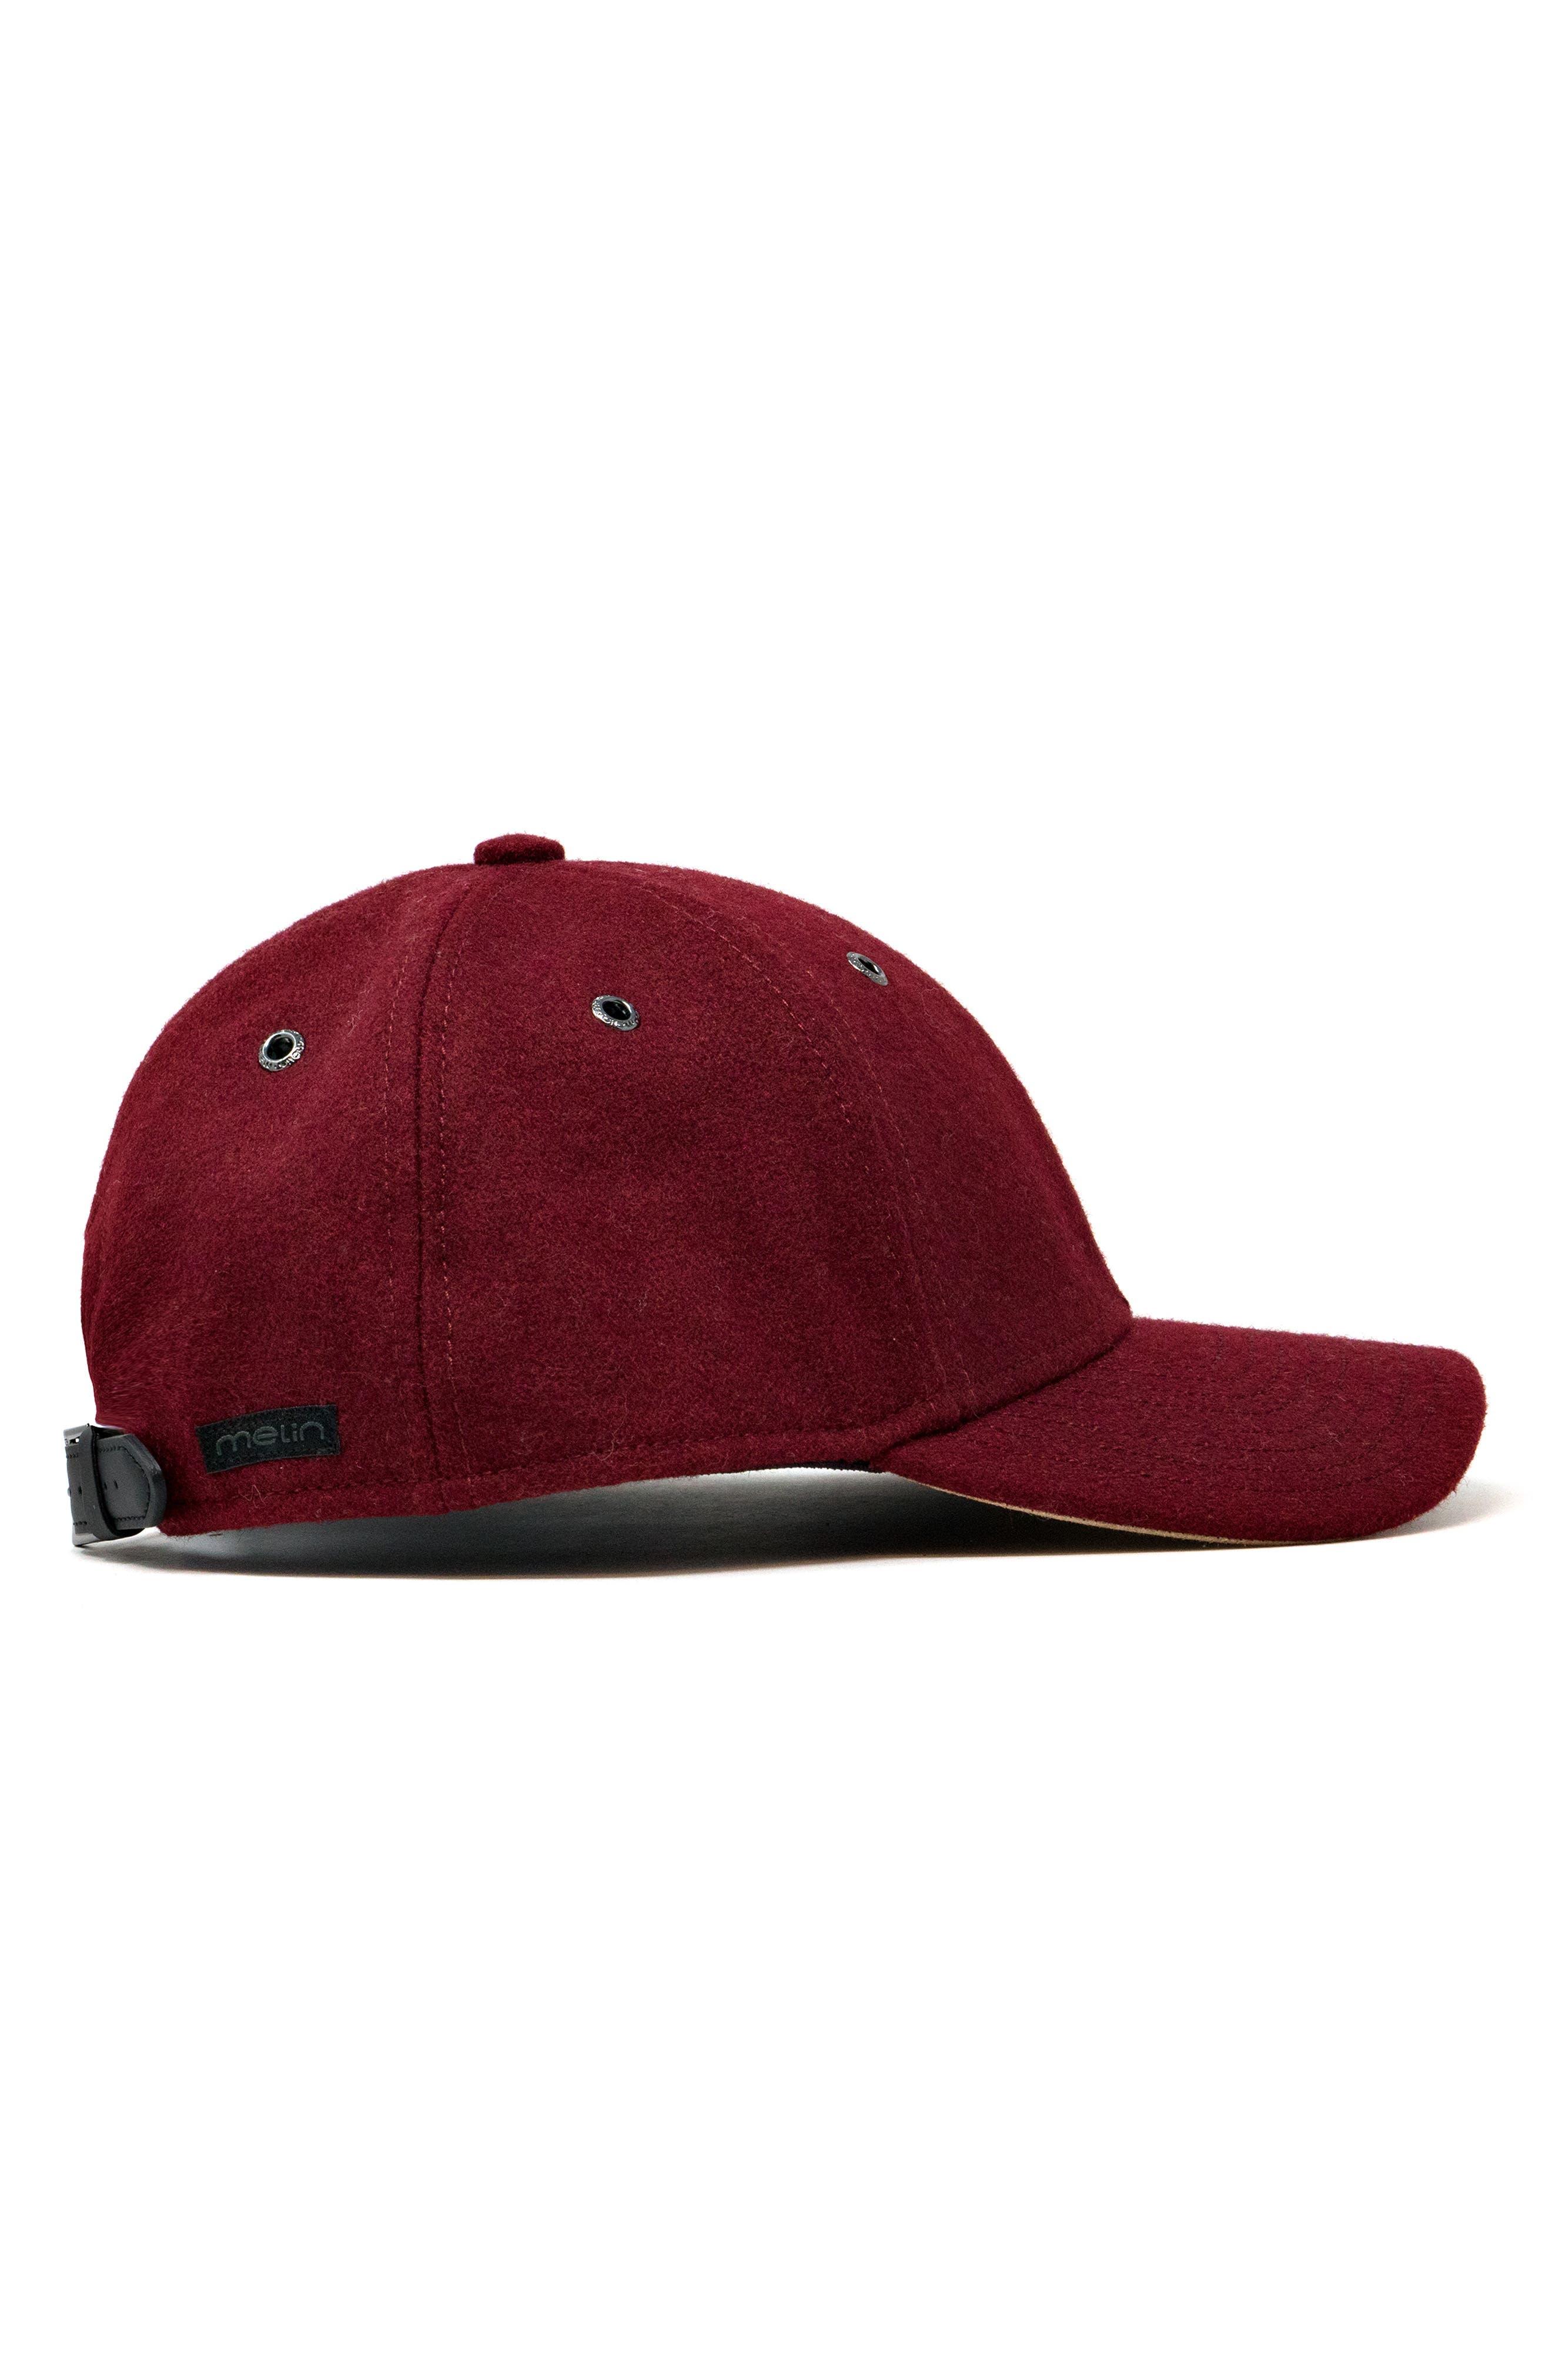 low priced 3c069 1b7cd ... germany new zealand melin glory days strapback baseball cap red 8d9f1  162ba eca8e 1f63b